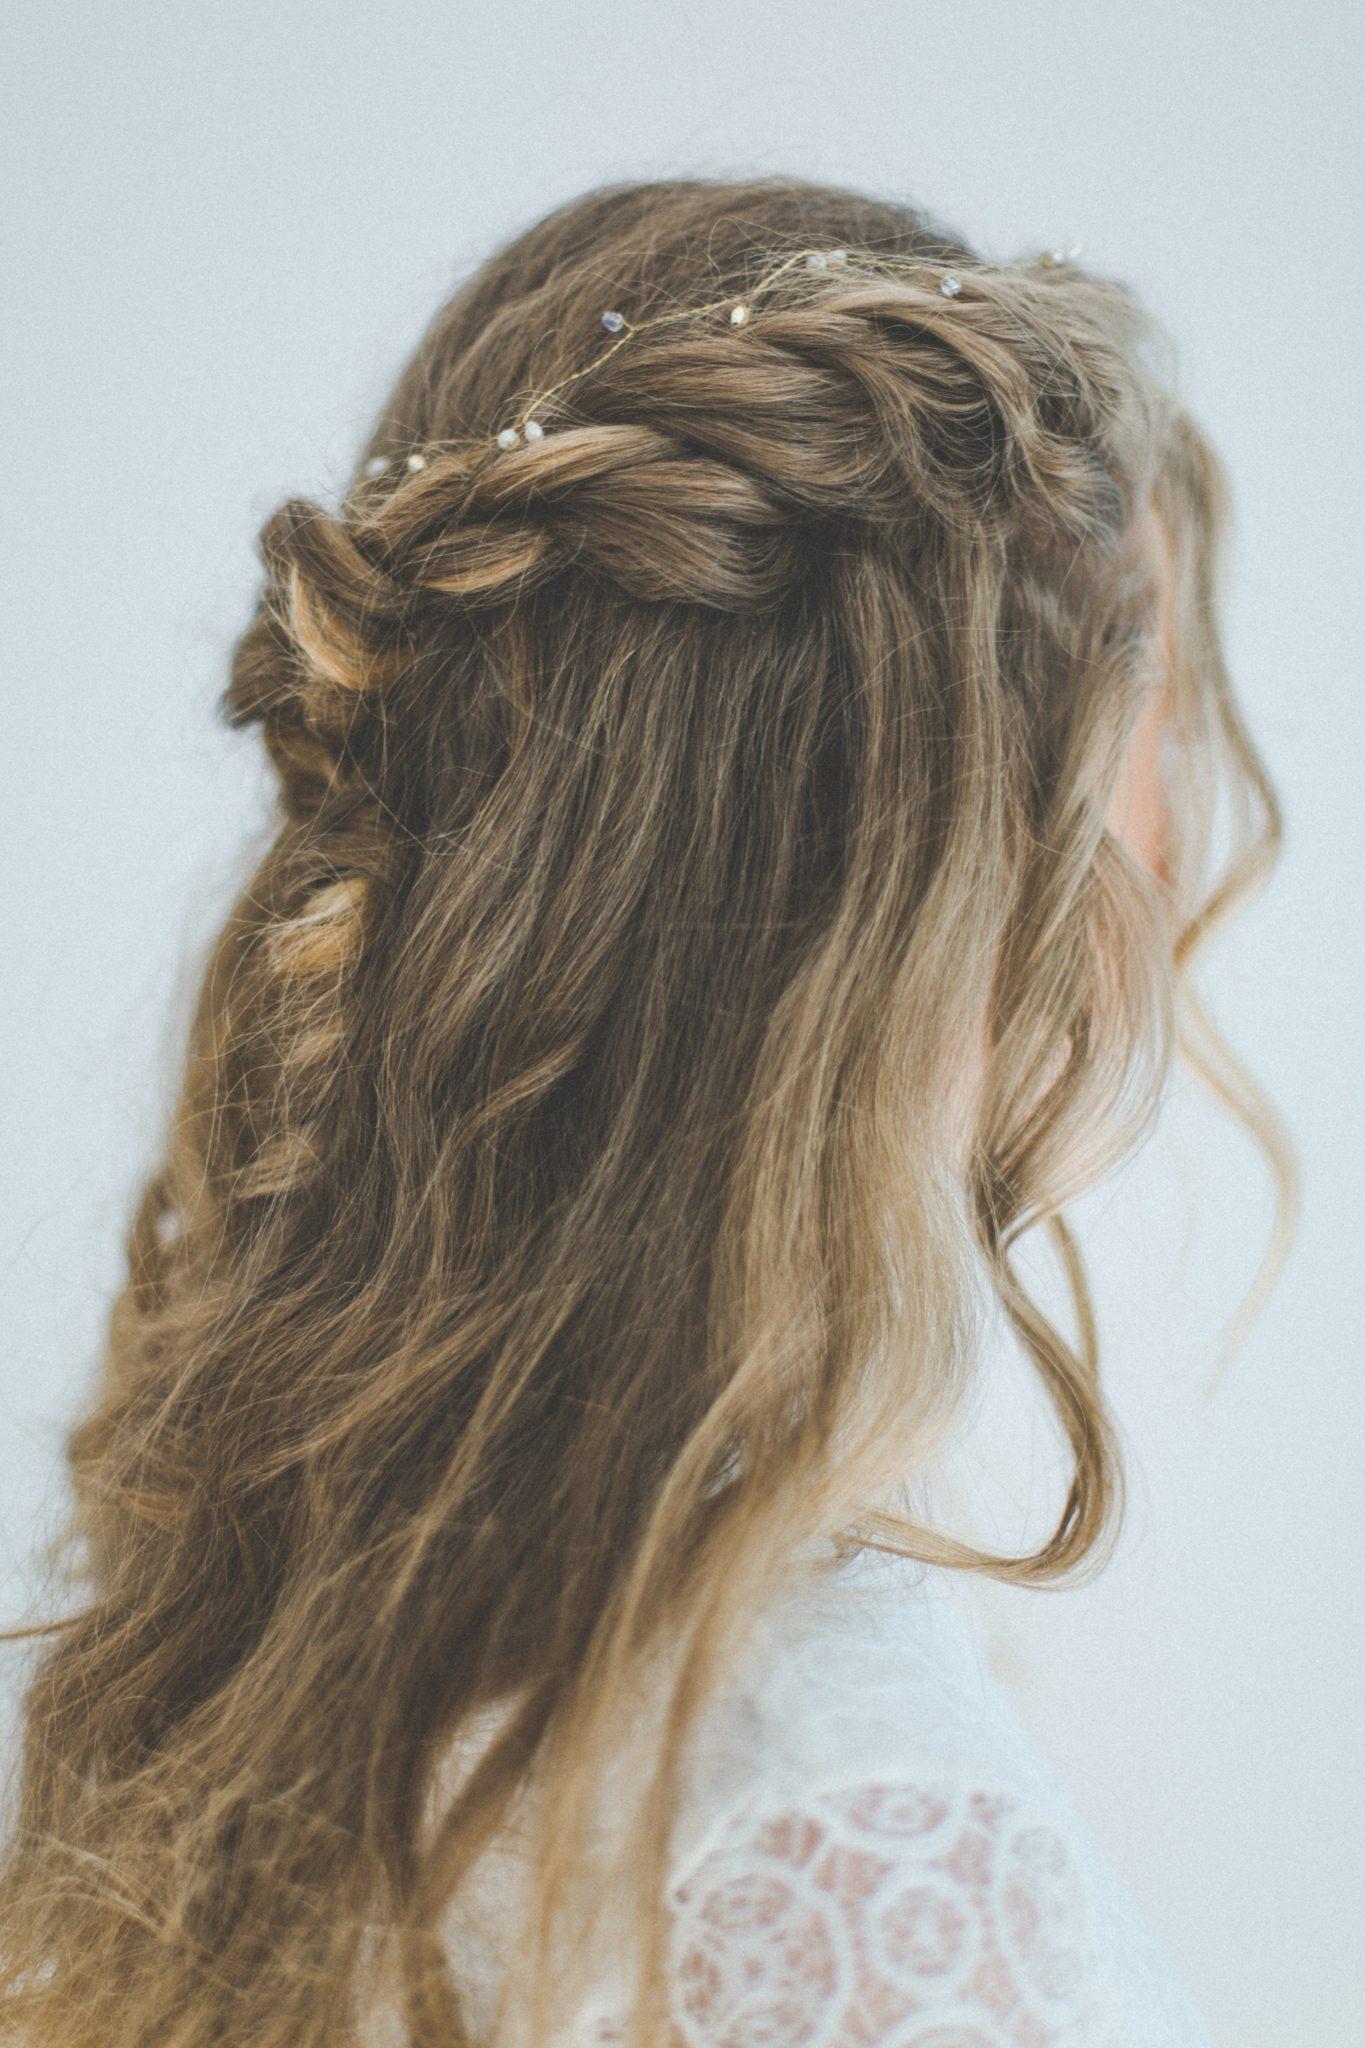 sara_hair_make-up_muenchen_zuzanna_grabias_hajsajs_6